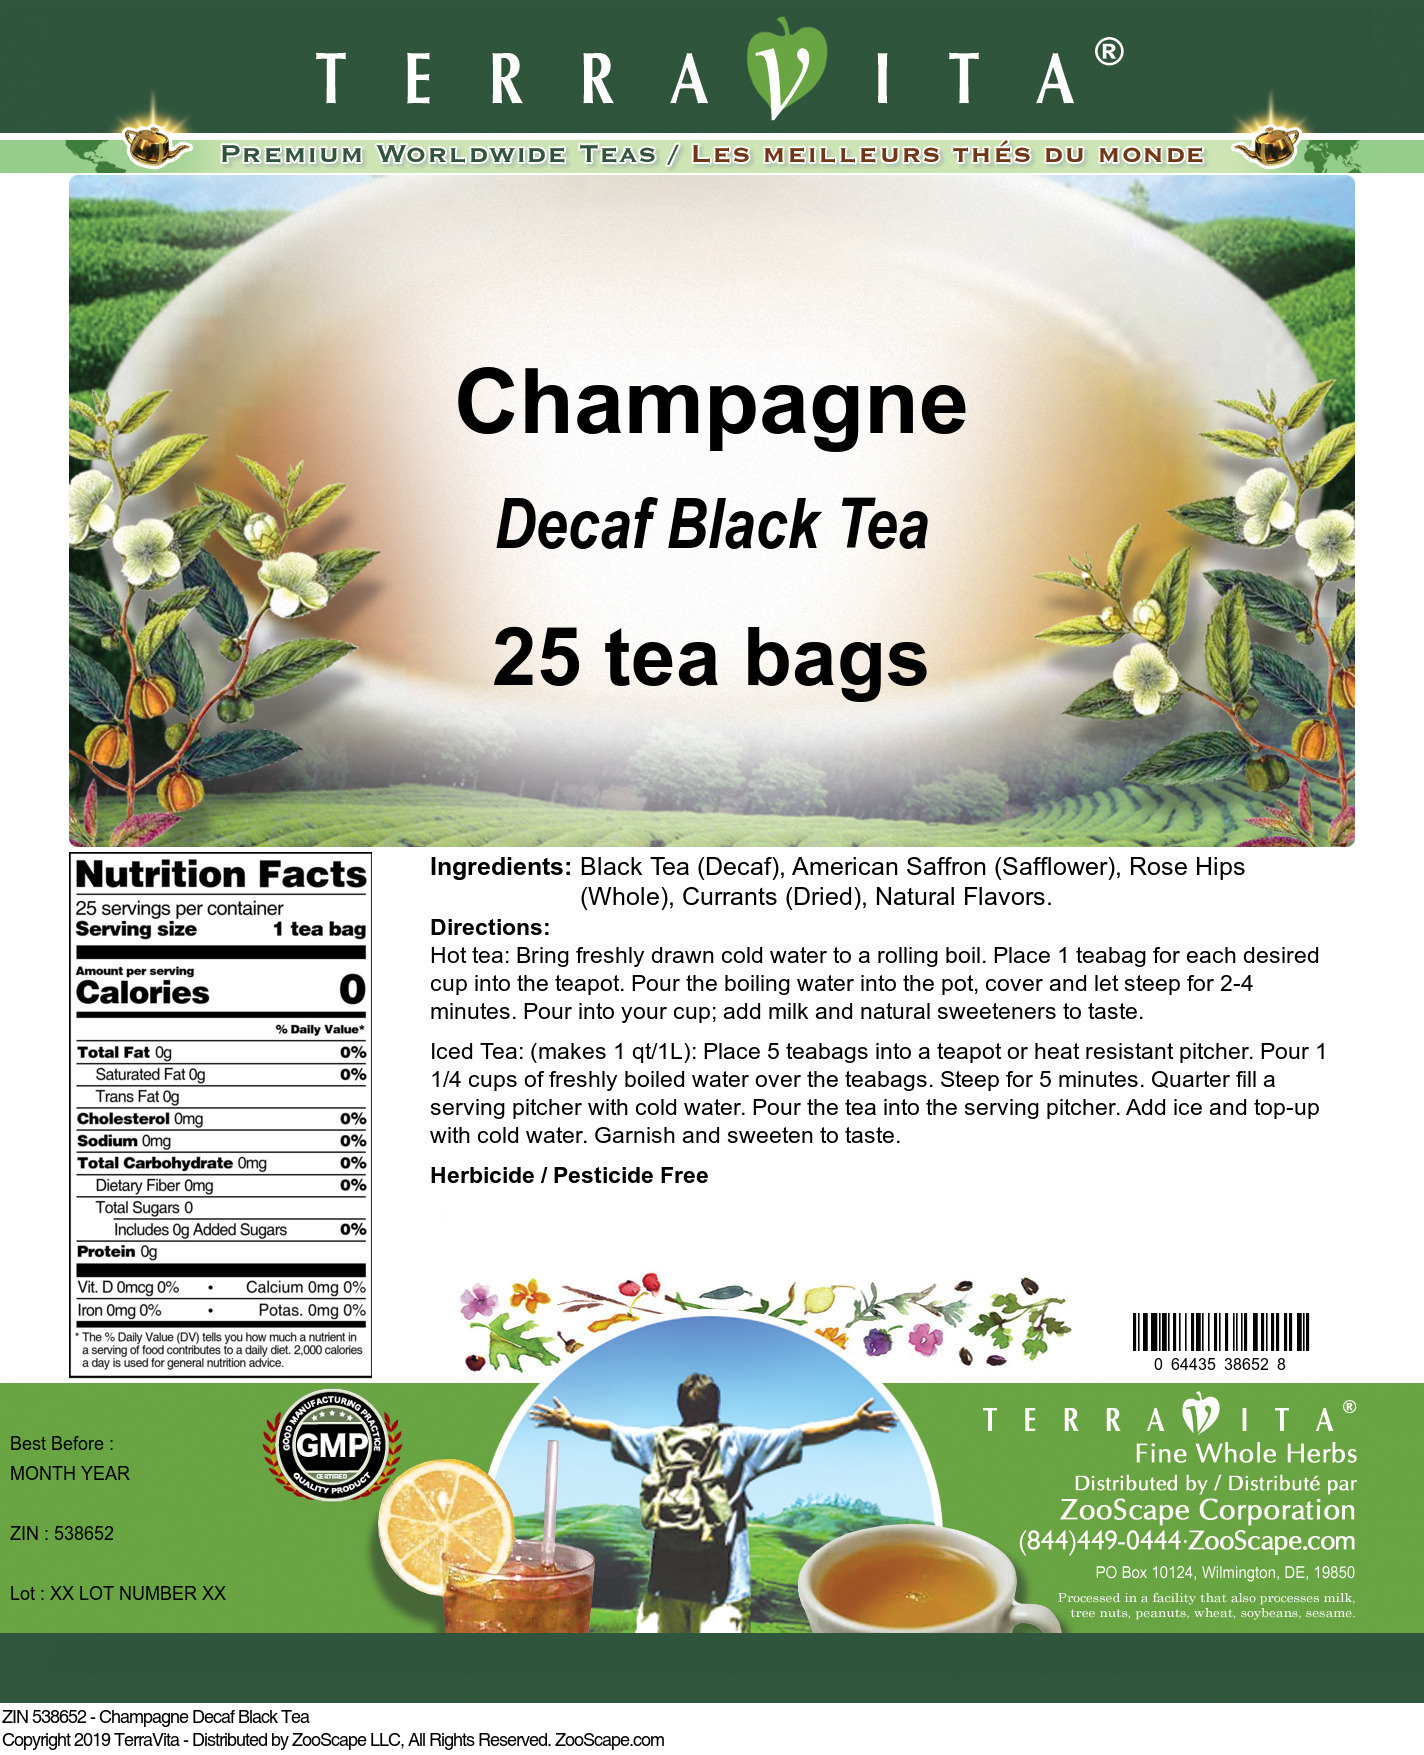 Champagne Decaf Black Tea